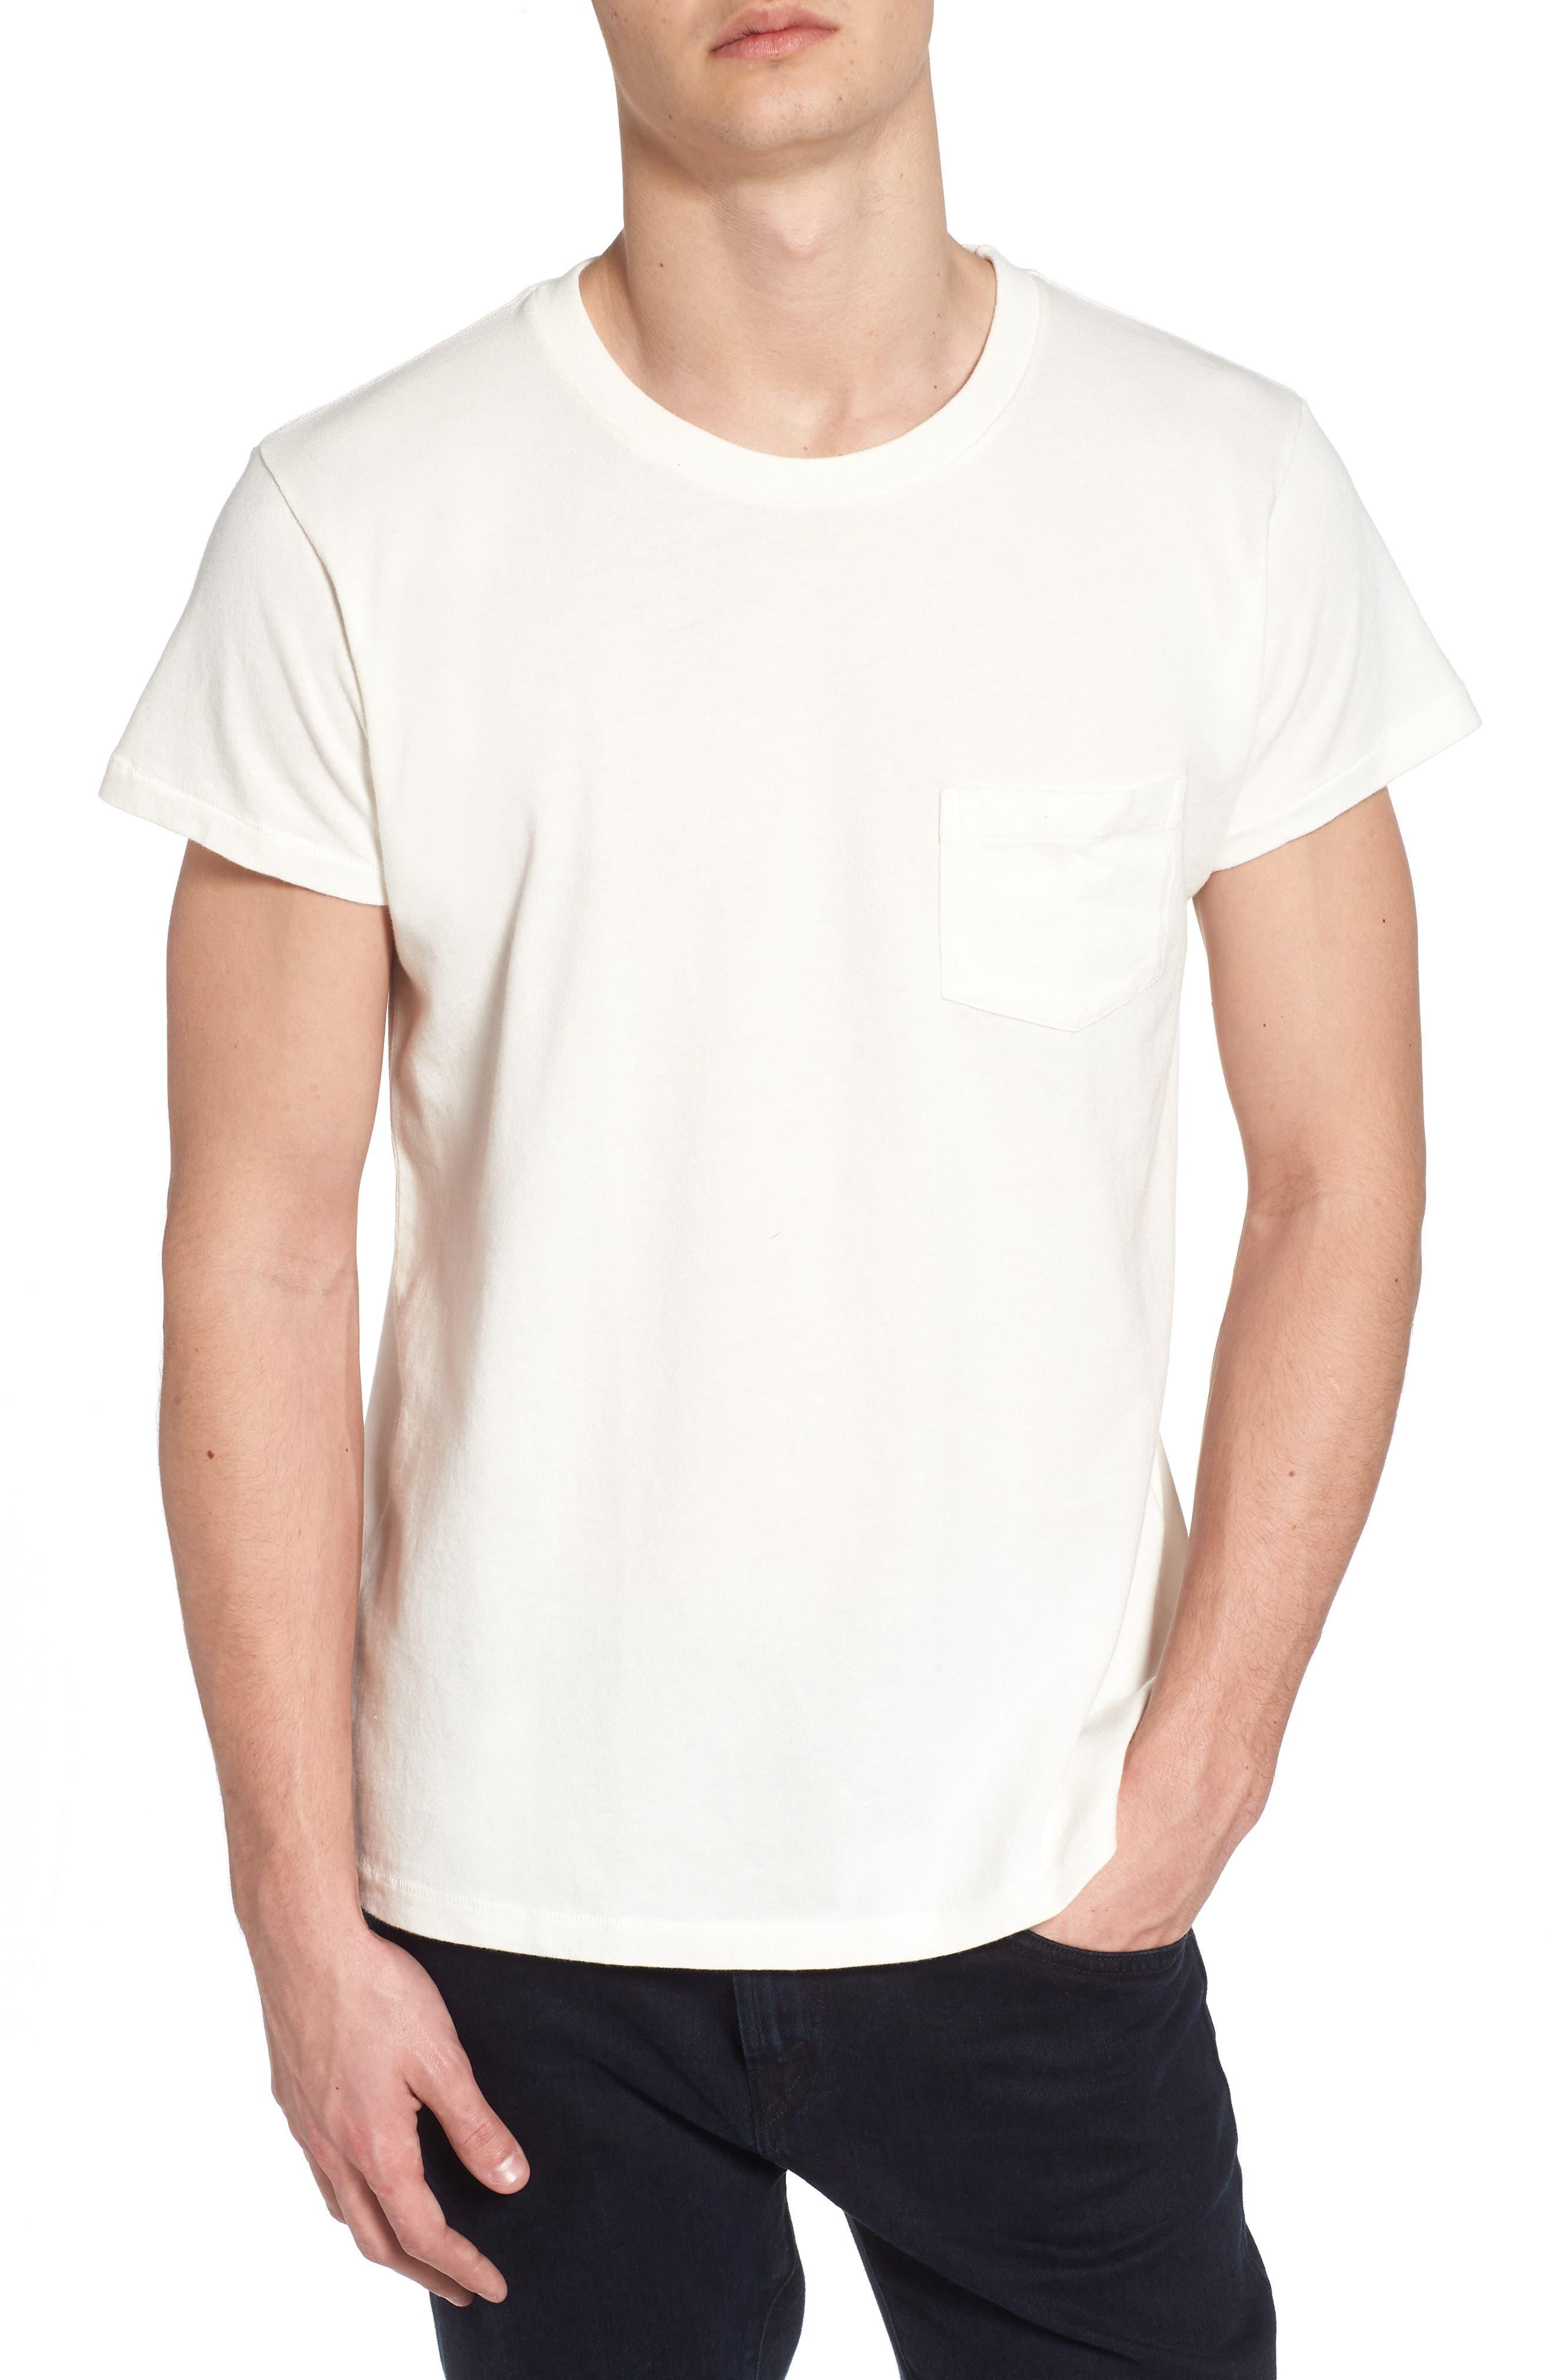 1950s Sportswear Pocket T-Shirt,                             Main thumbnail 1, color,                             White